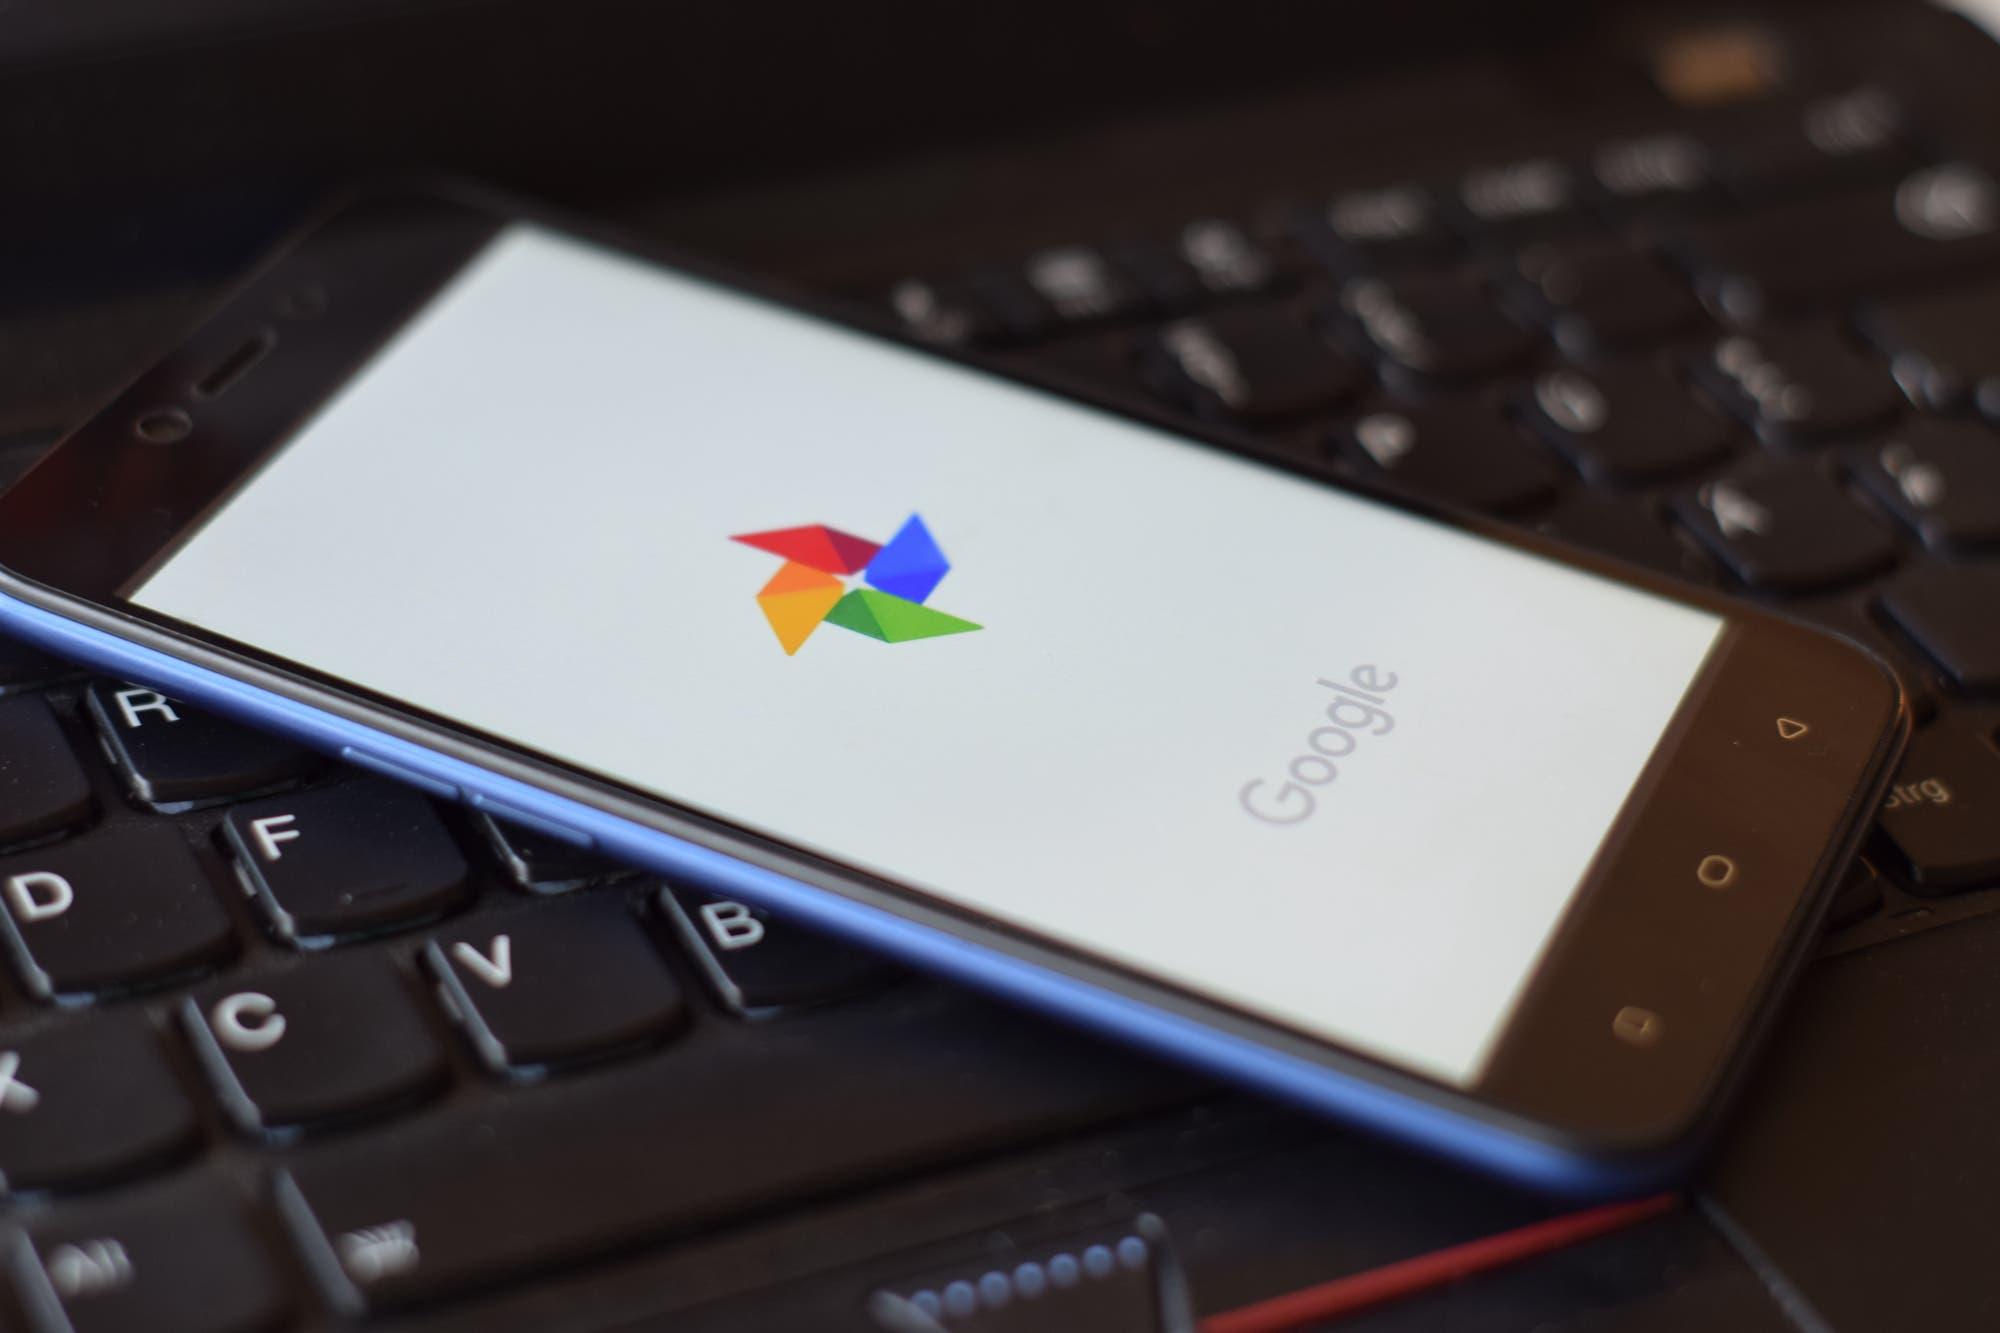 Google admite que expuso videos privados que estaban almacenados en Google Fotos